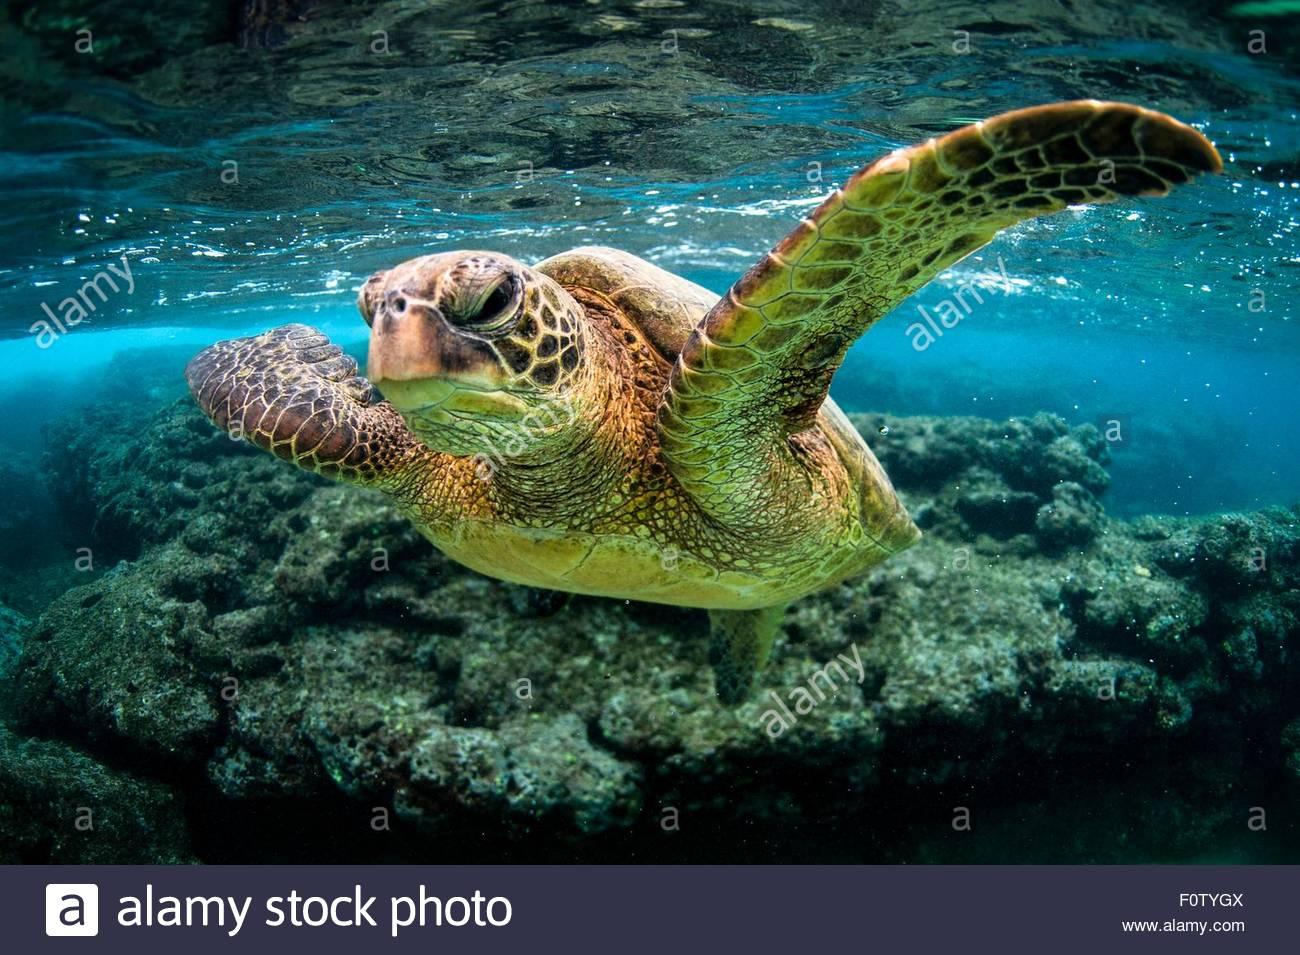 Turtle in sea, Kauai island, Hawaii Islands - Stock Image